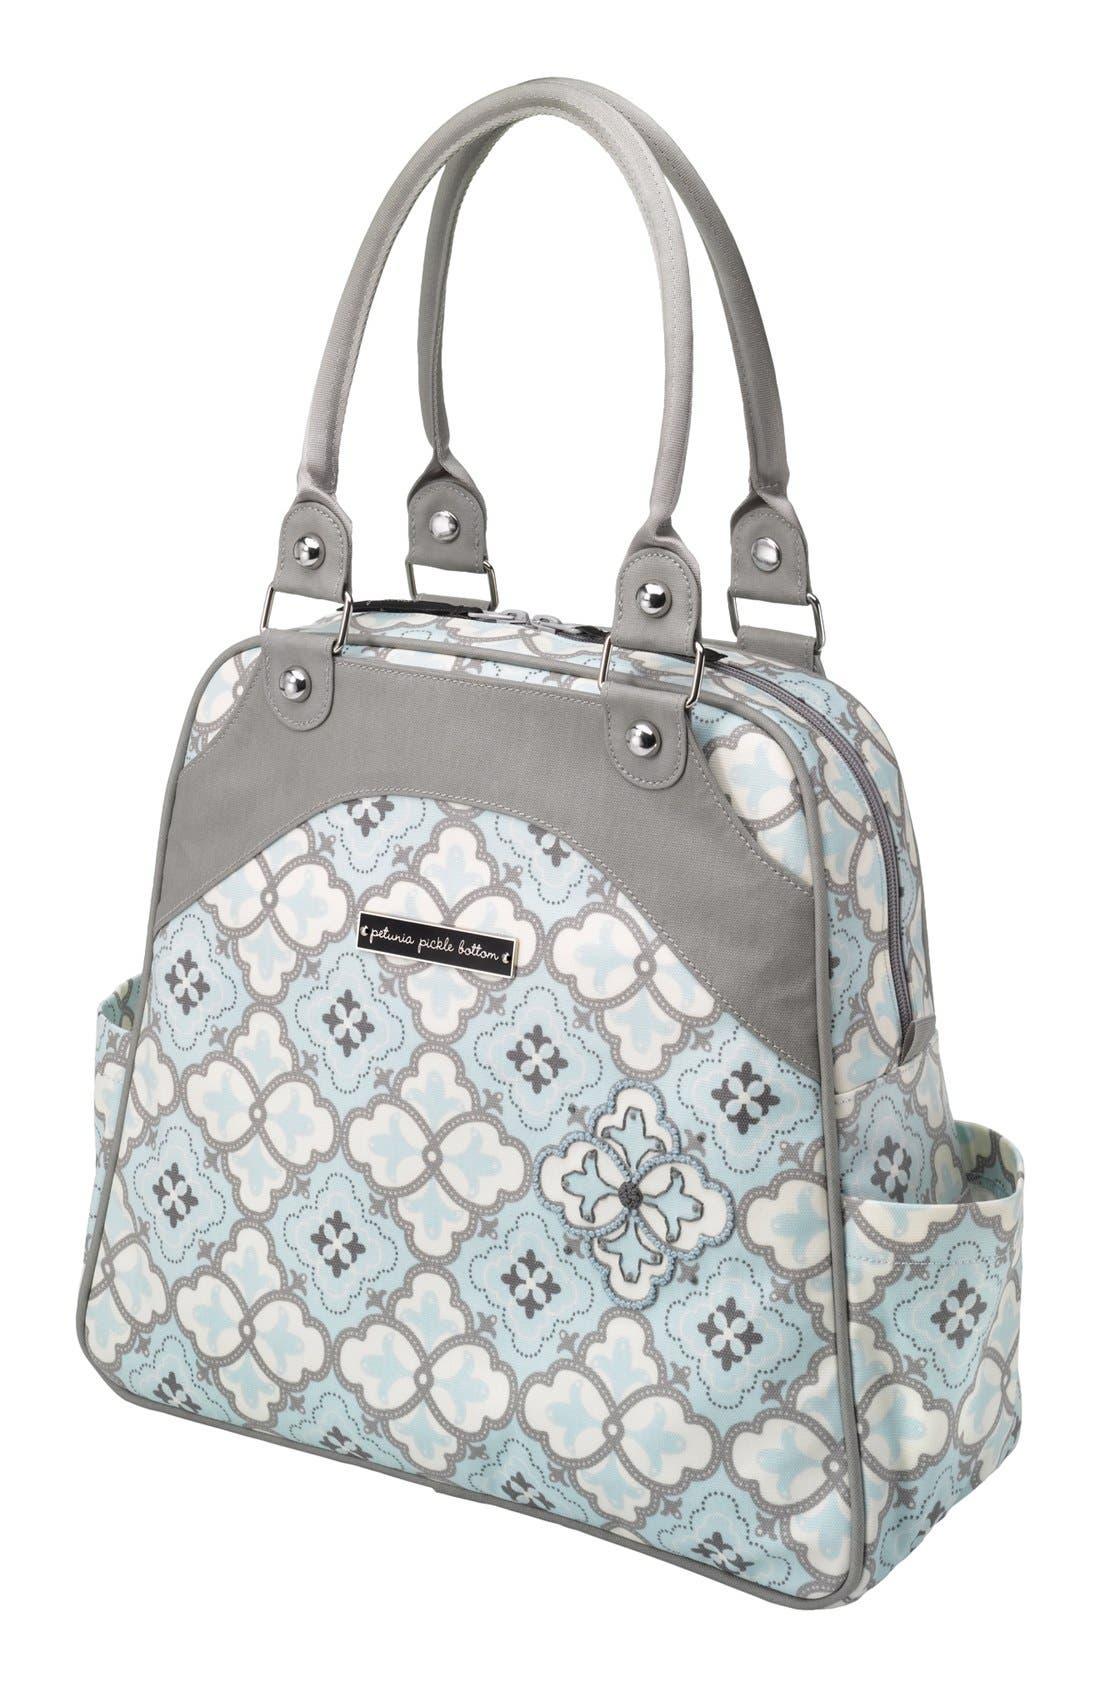 Alternate Image 1 Selected - Petunia Pickle Bottom 'Sashay Satchel' Glazed Diaper Bag